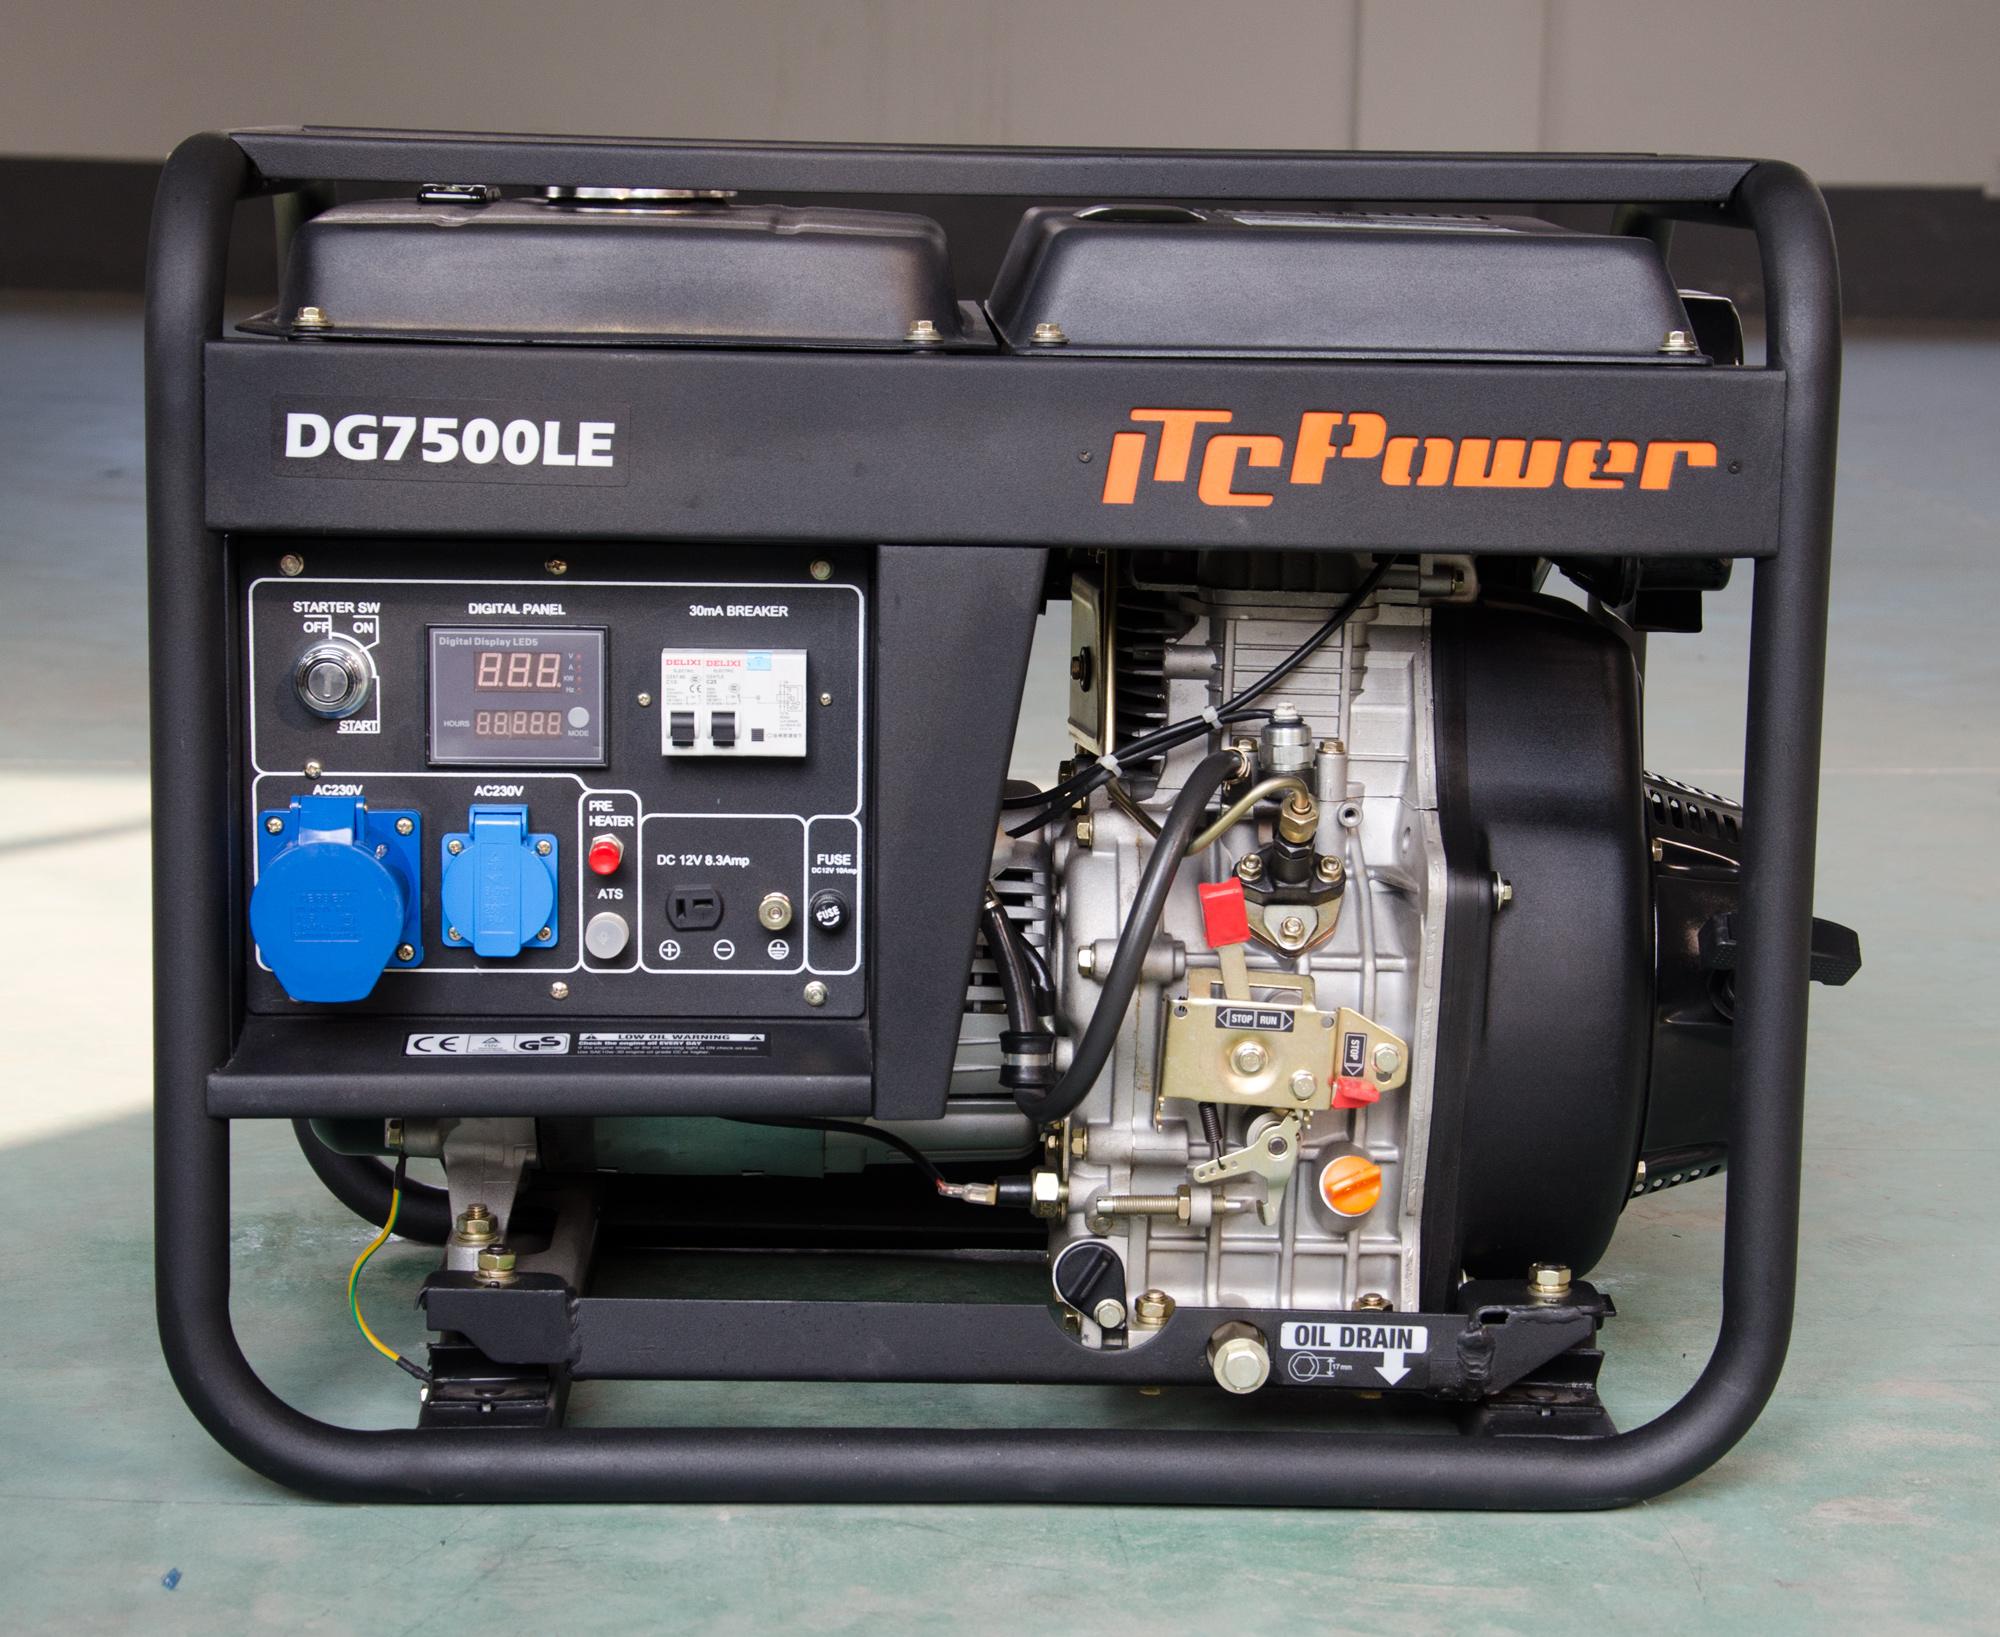 VORVERKAUF!!! ITC POWER 6500 Watt Diesel DG7800LE Stromaggregat